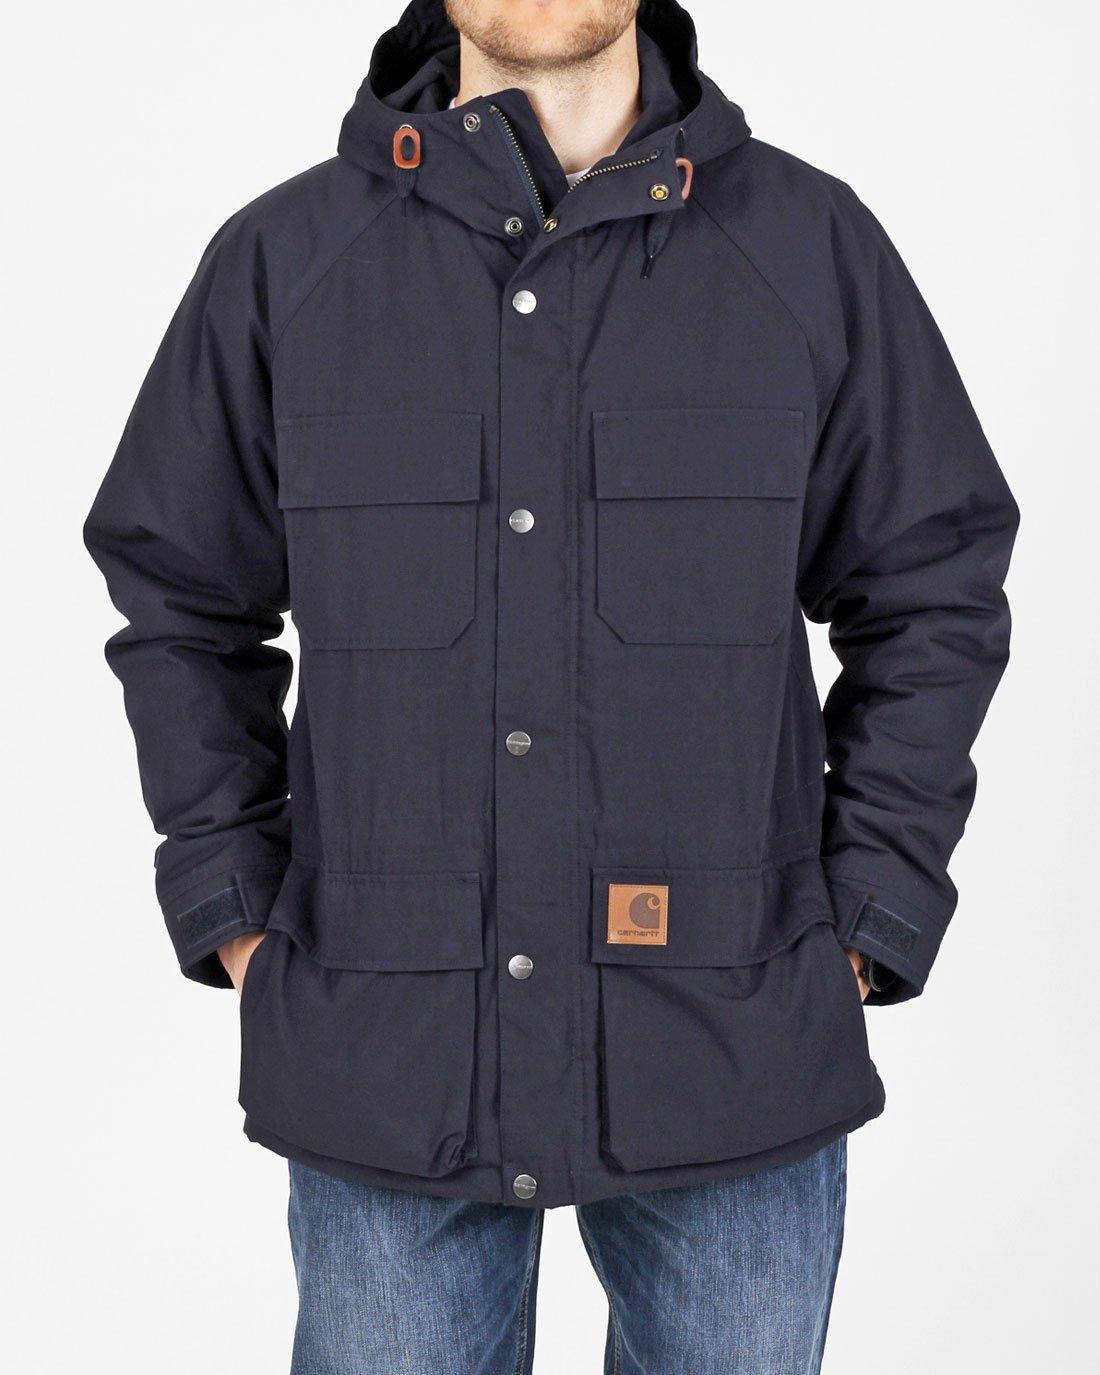 CARHARTT Herren Jacken Mosley Jacket jetzt kaufen